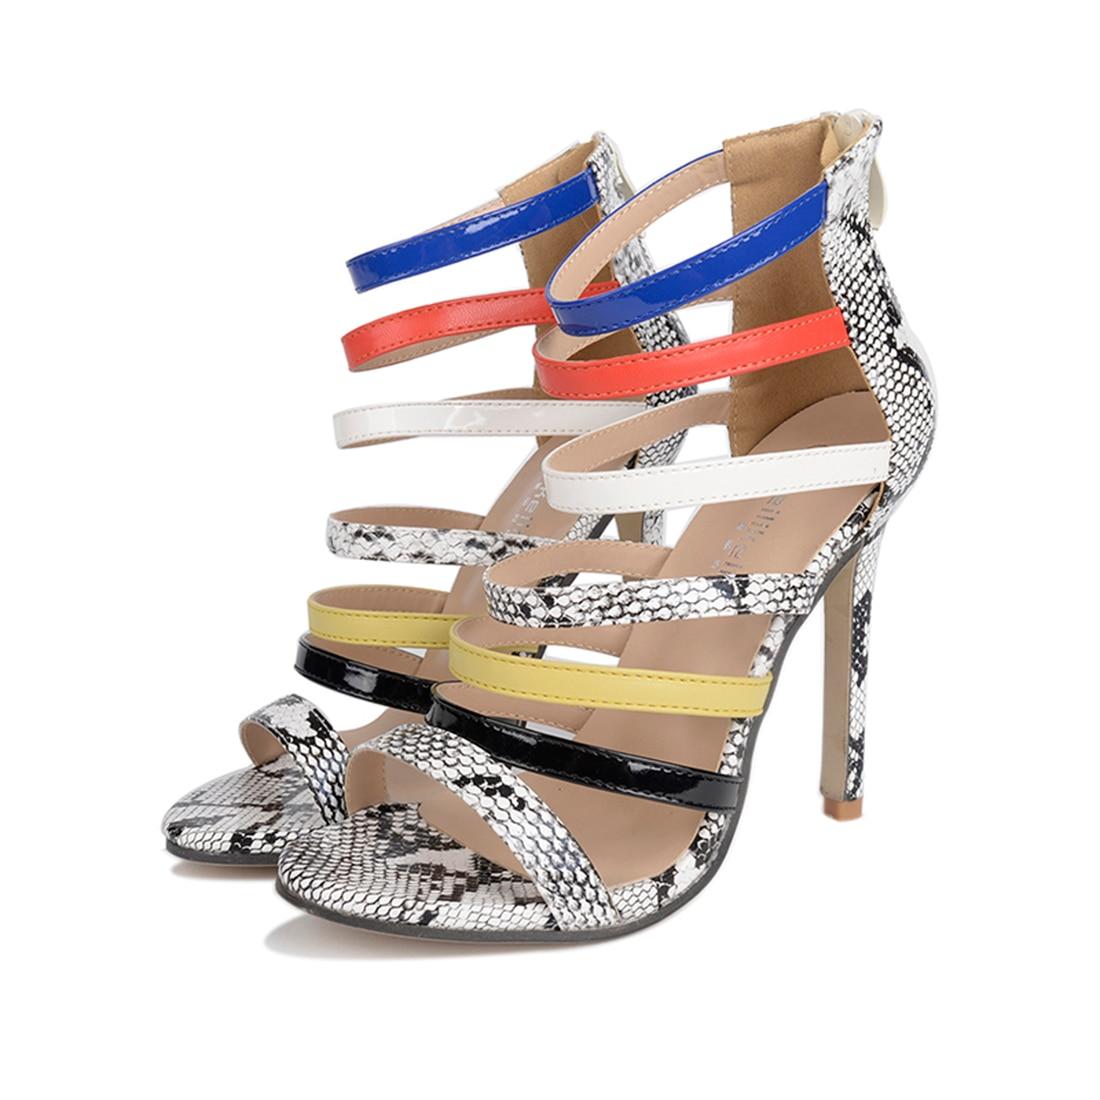 European sandals shoes - Summer Women Sandals Open Toe Flip Flops Women S Sandals Thick Heel European Gladiator Sandals Shoes Platform